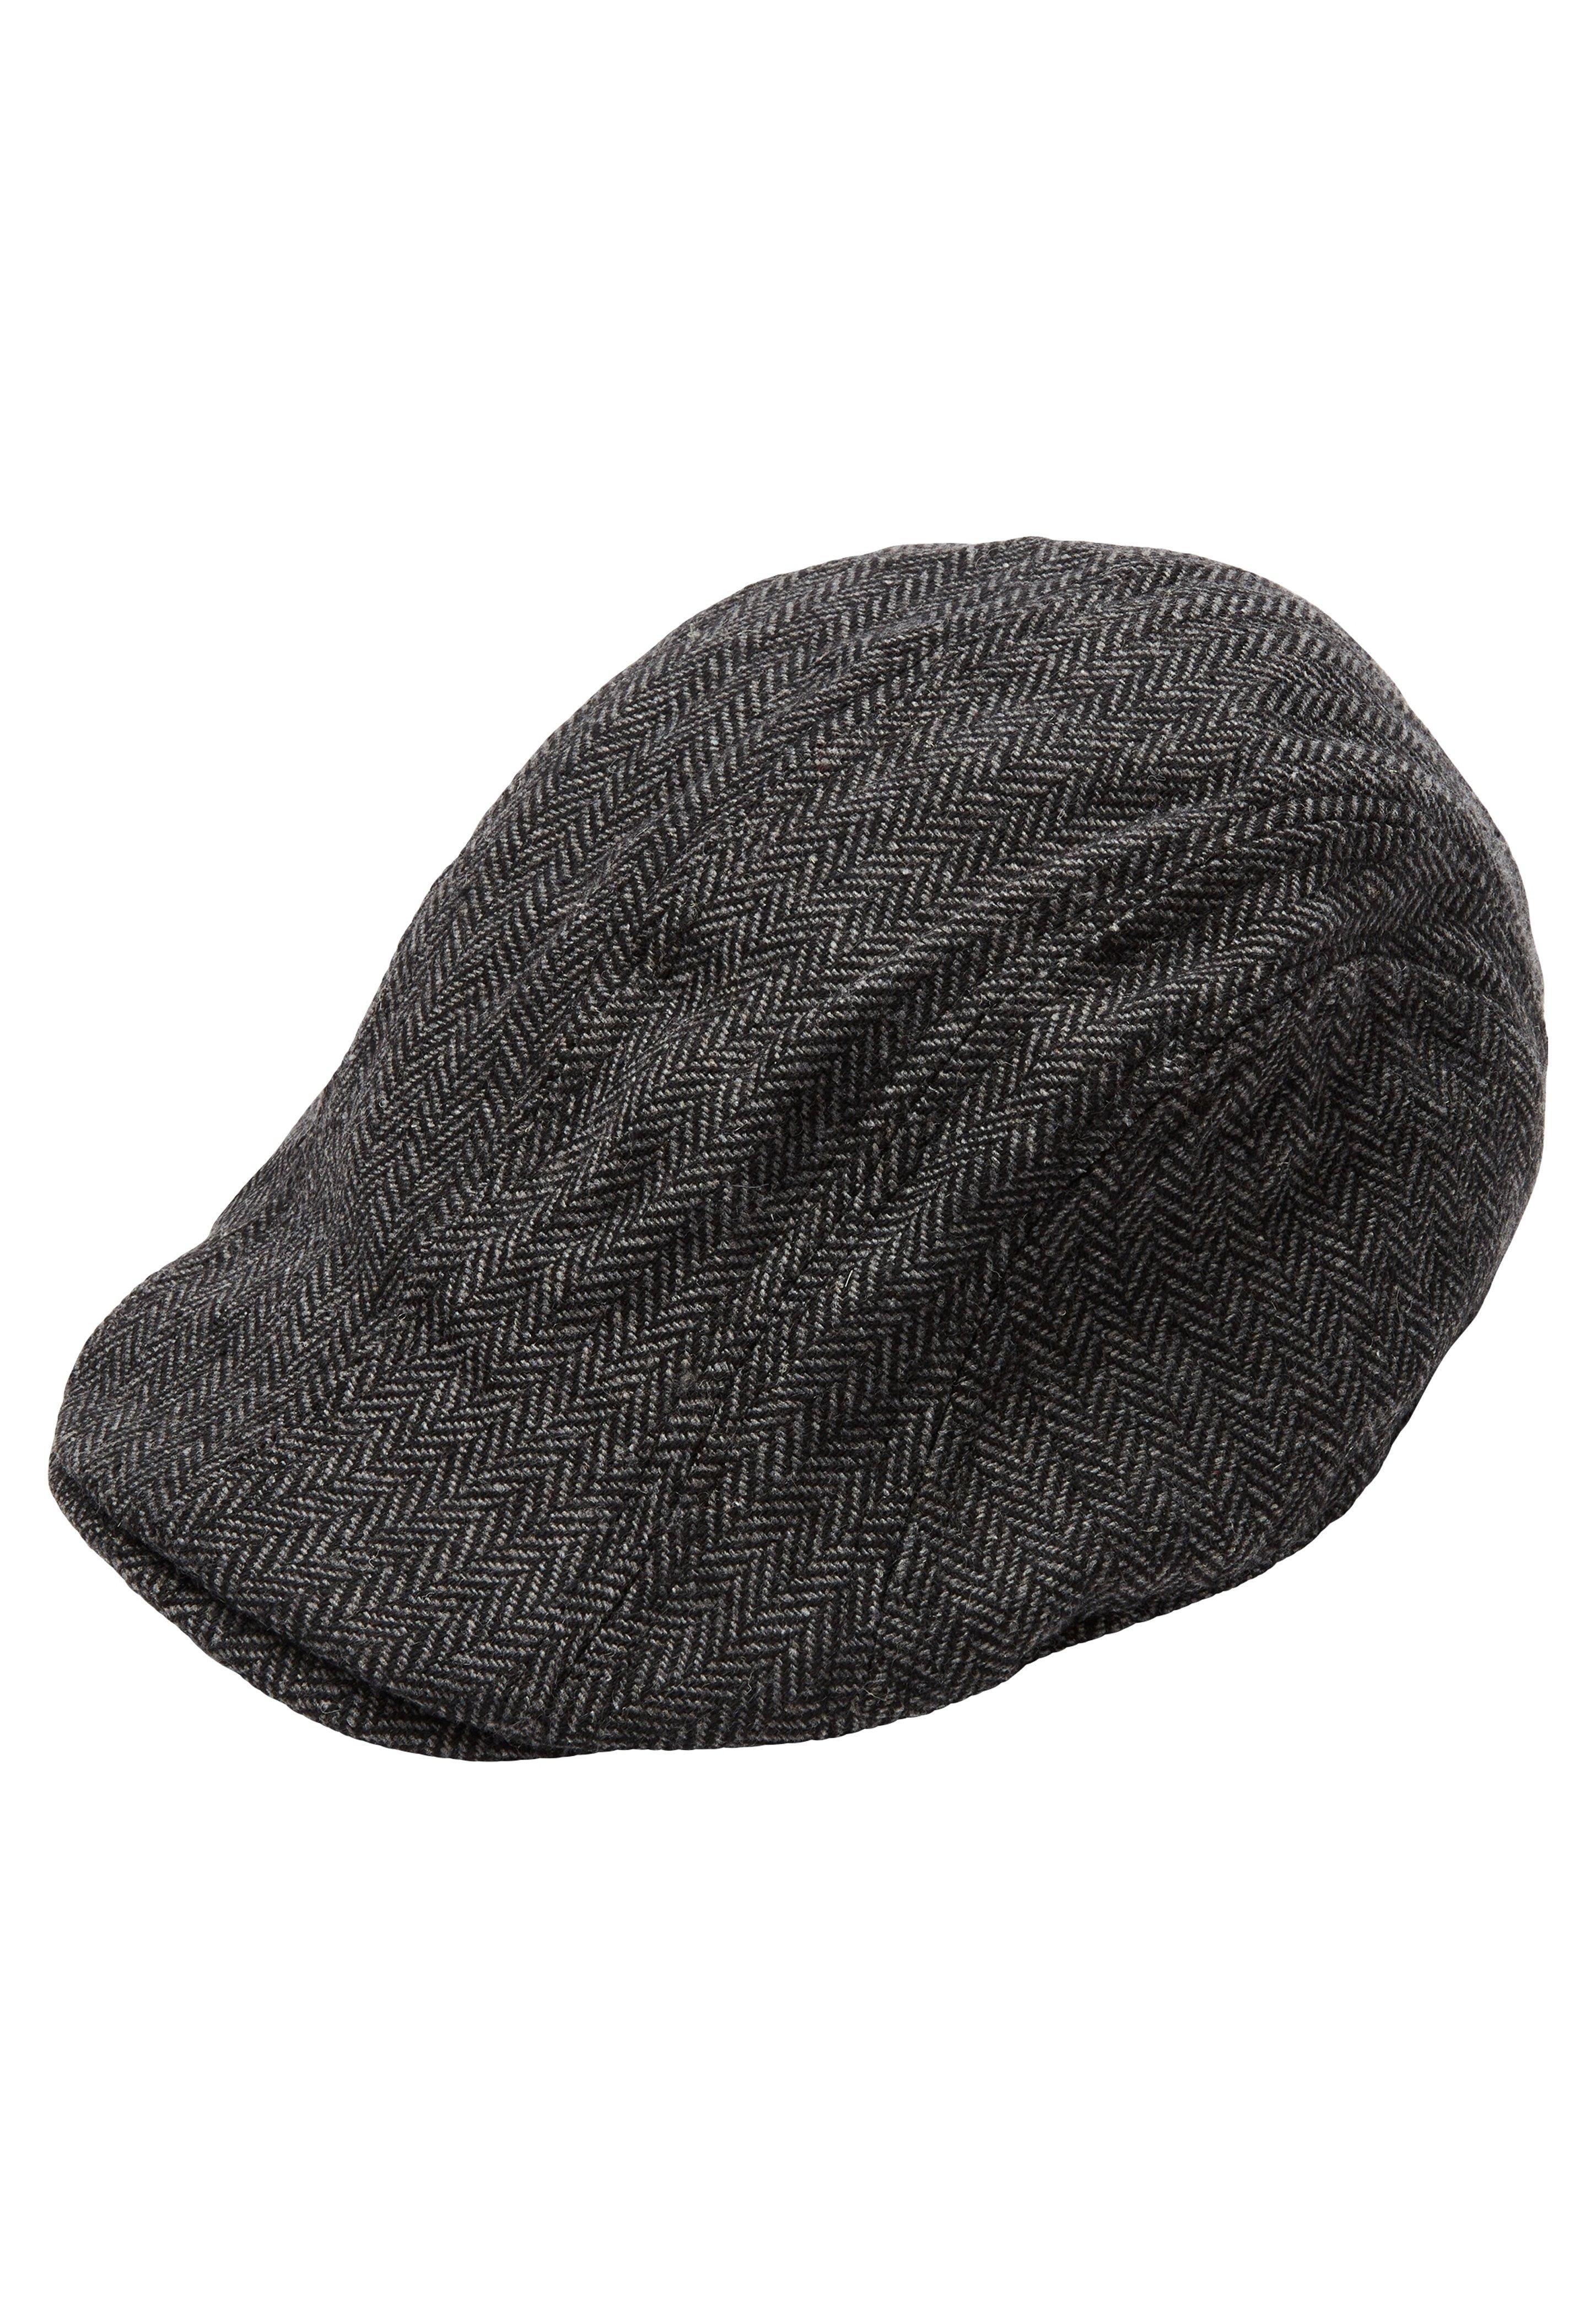 S.oliver Cap - Grey Heringbone/grau